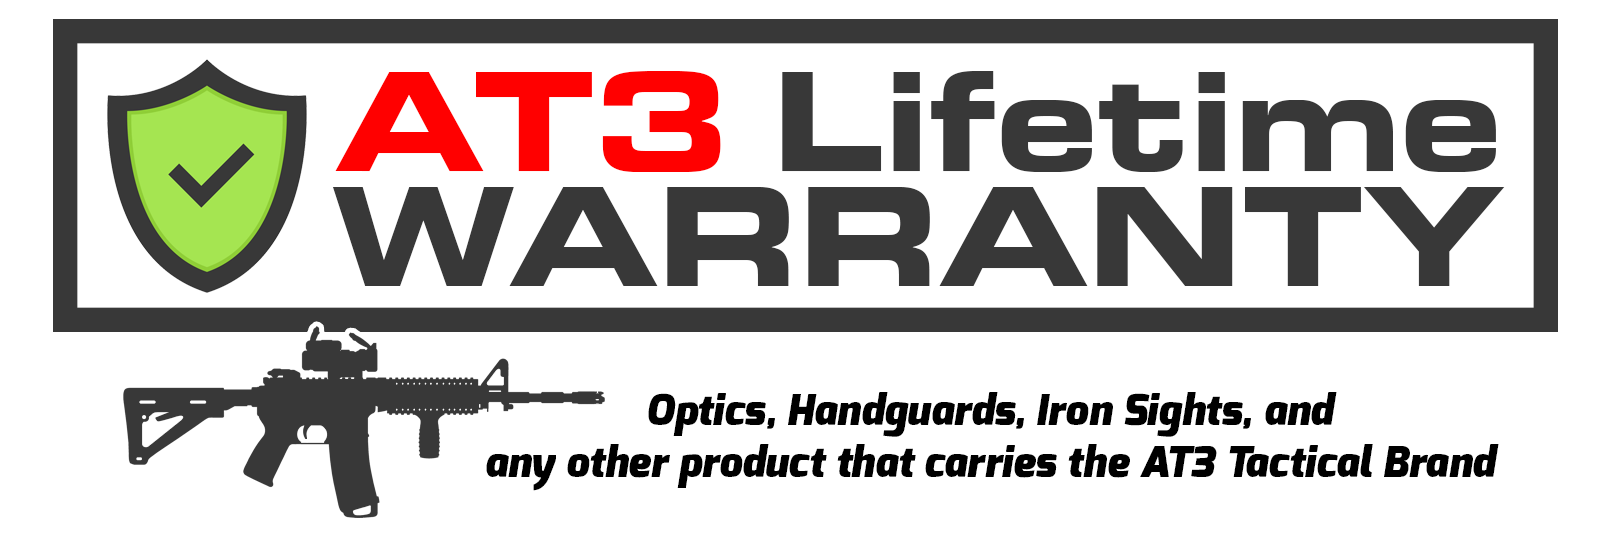 AT3 Lifetime Warranty Logo